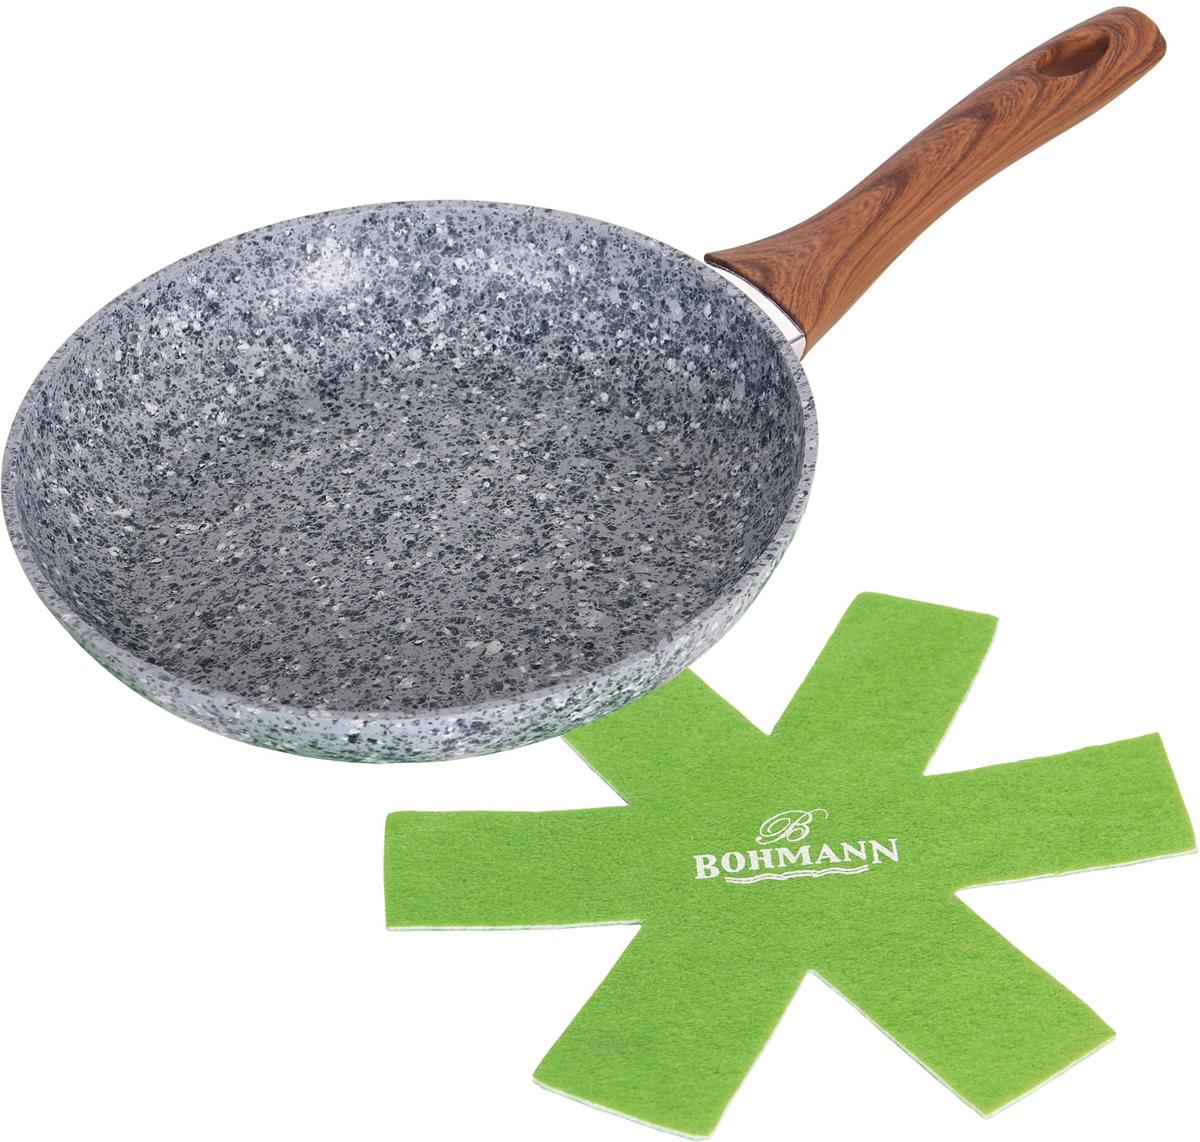 Сковорода Bohmann, с подставкой, цвет: серый. Диаметр 24 см. 1015-24BHGRN сковорода bohmann 372124вн серый диаметр 24 см